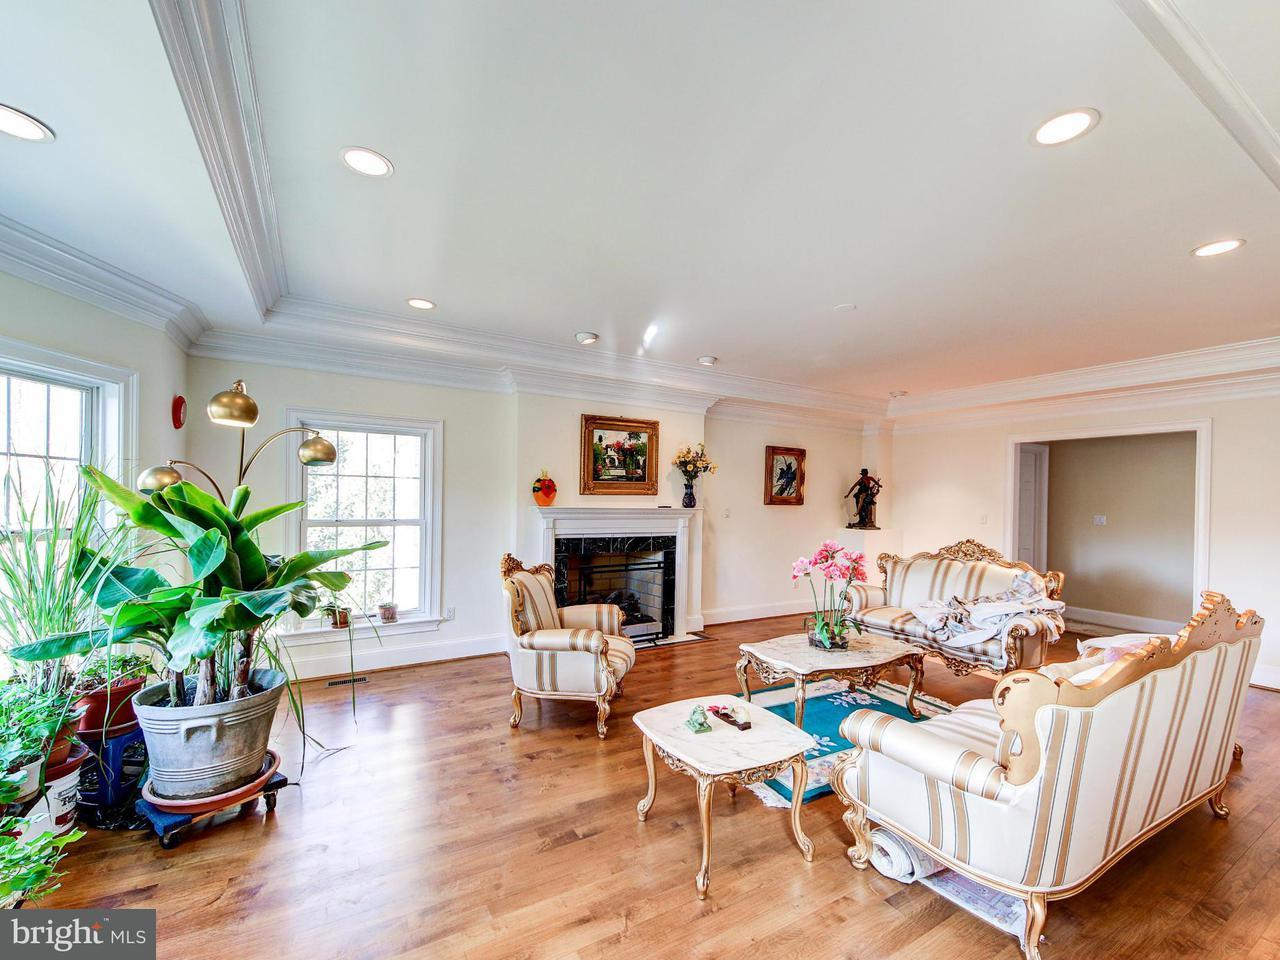 Single Family Home for Sale at 11608 Brockman Lane 11608 Brockman Lane Great Falls, Virginia 22066 United States